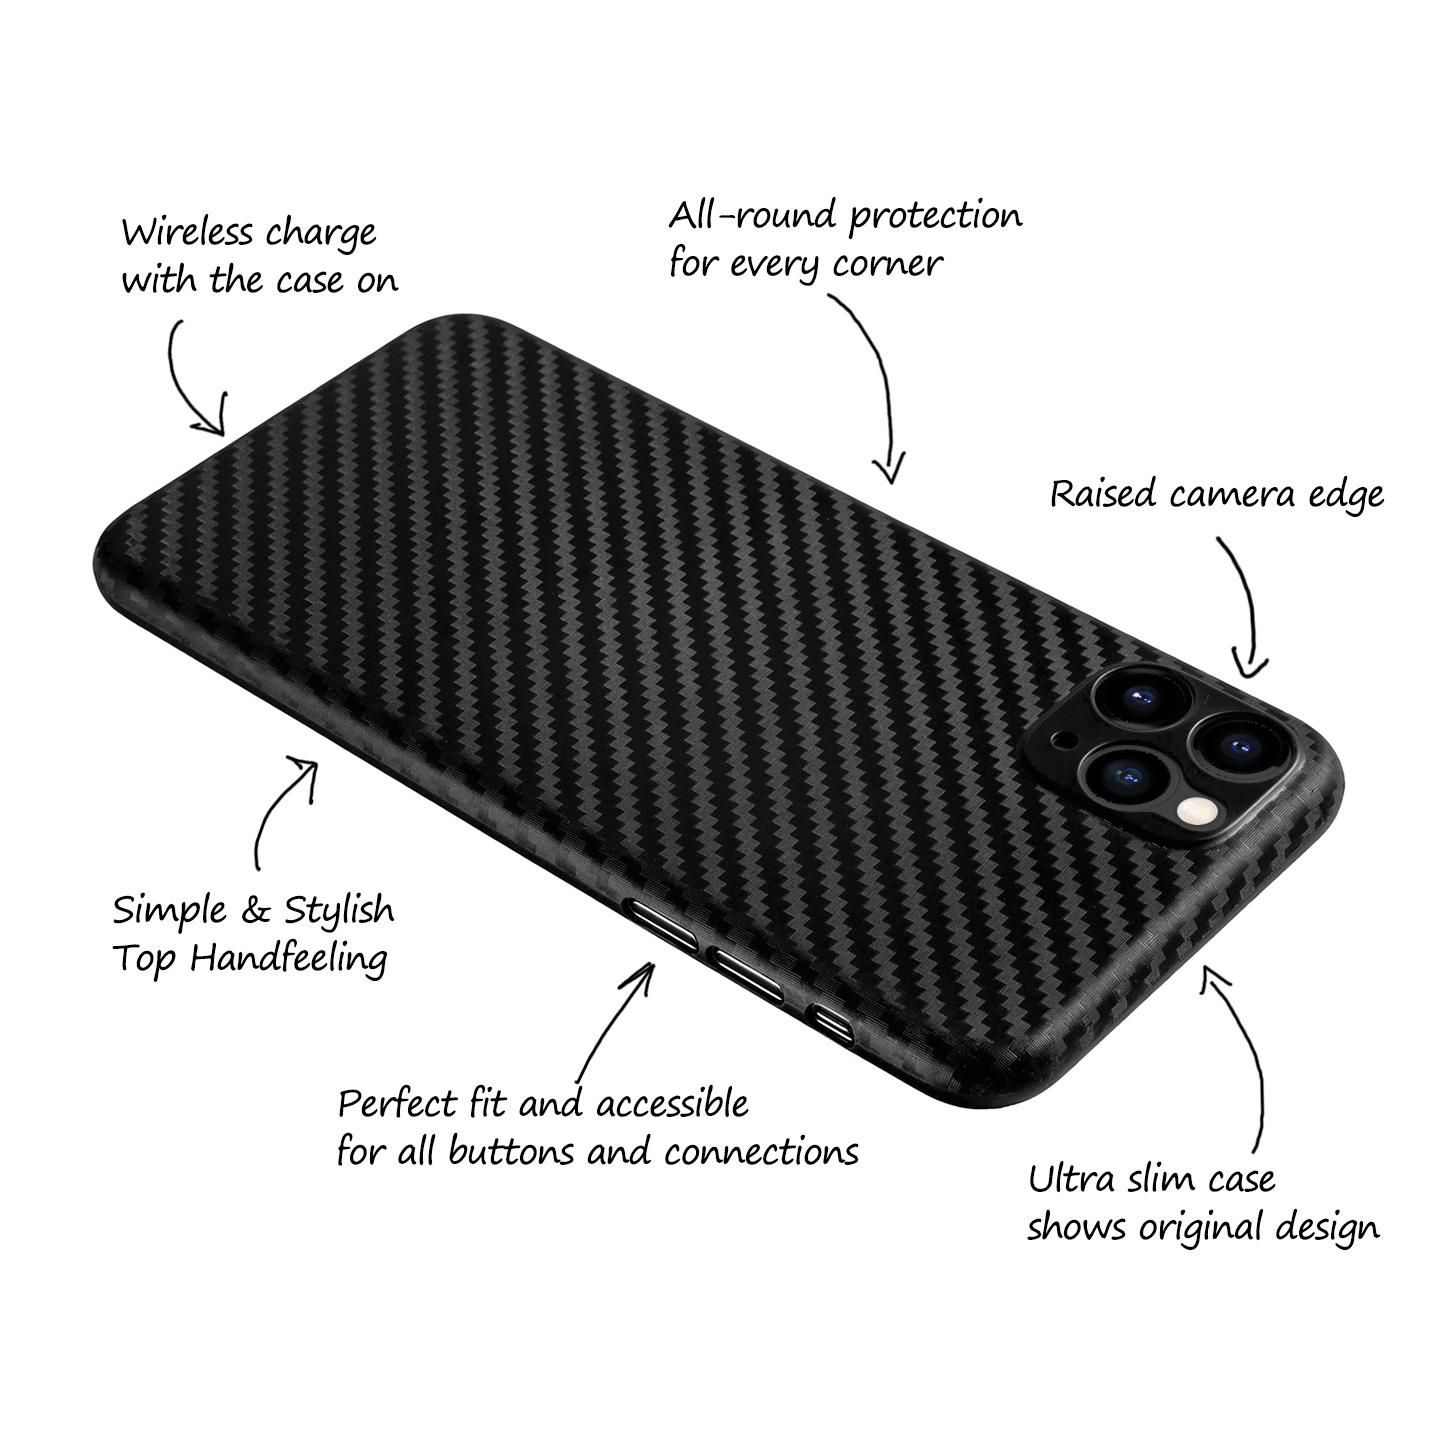 Ultra-Slim-Case-iPhone-11-Pro-5-8-034-Matt-Clear-Schutz-Huelle-Skin-Cover-Etui-Folie Indexbild 10